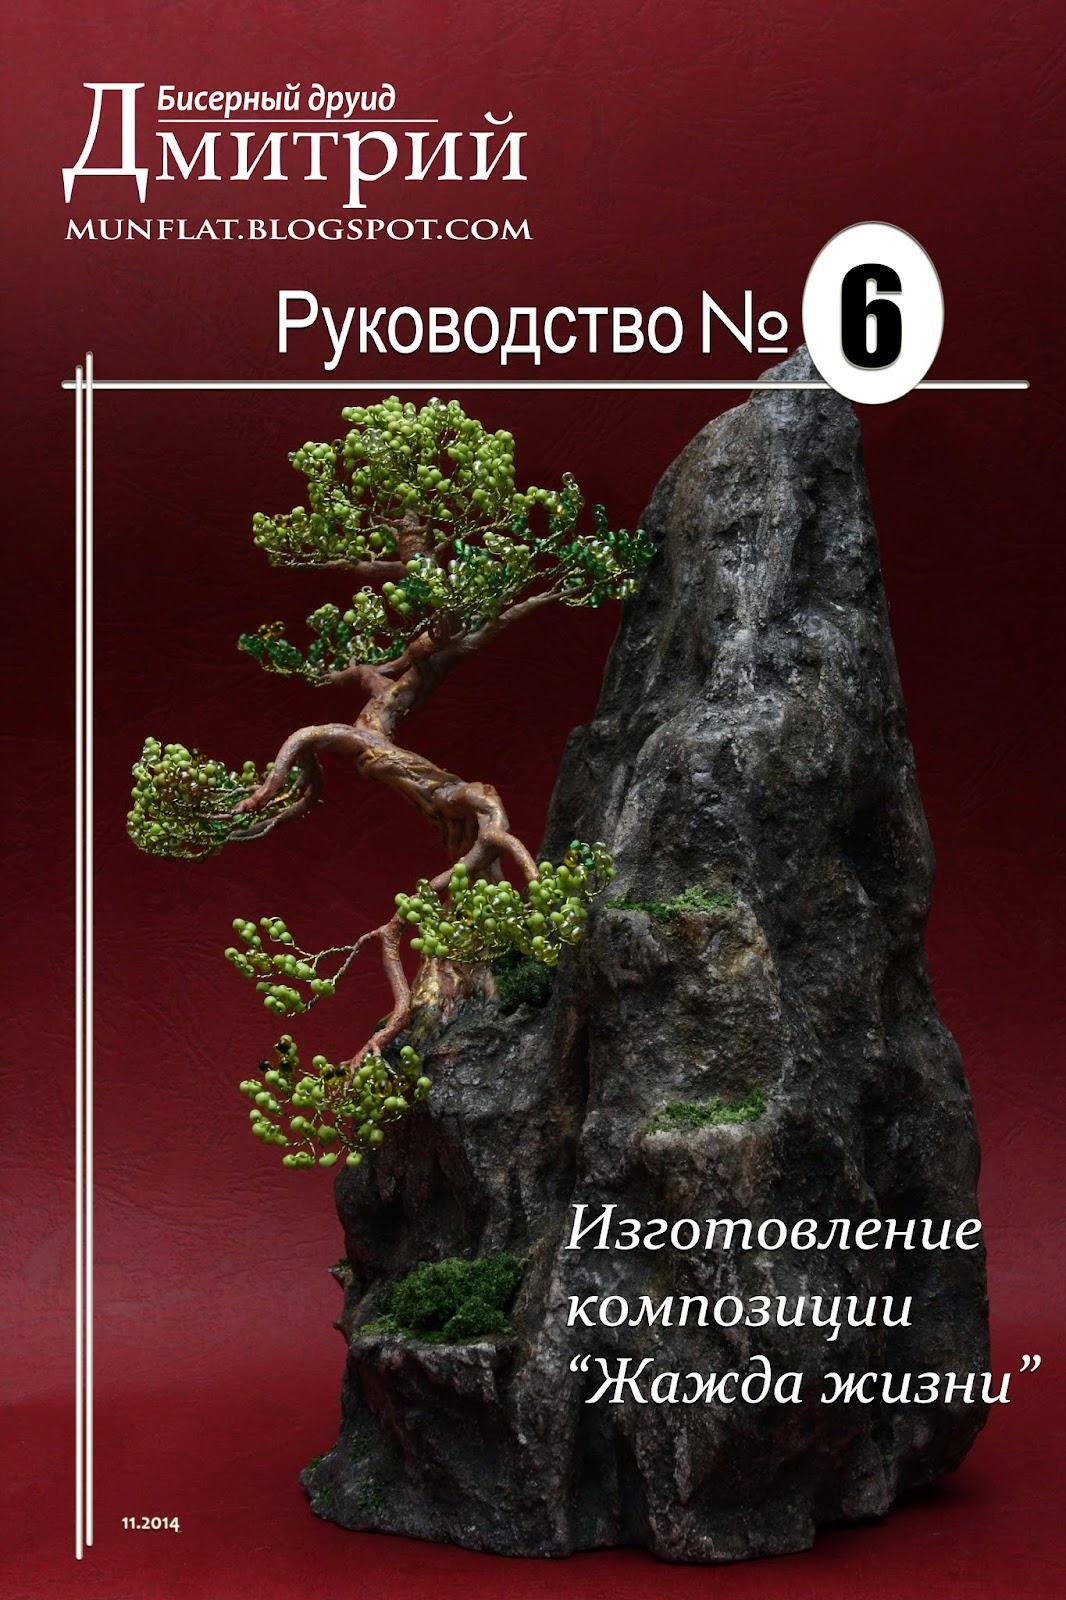 plati.ru/asp/pay.asp?id_d=1824503